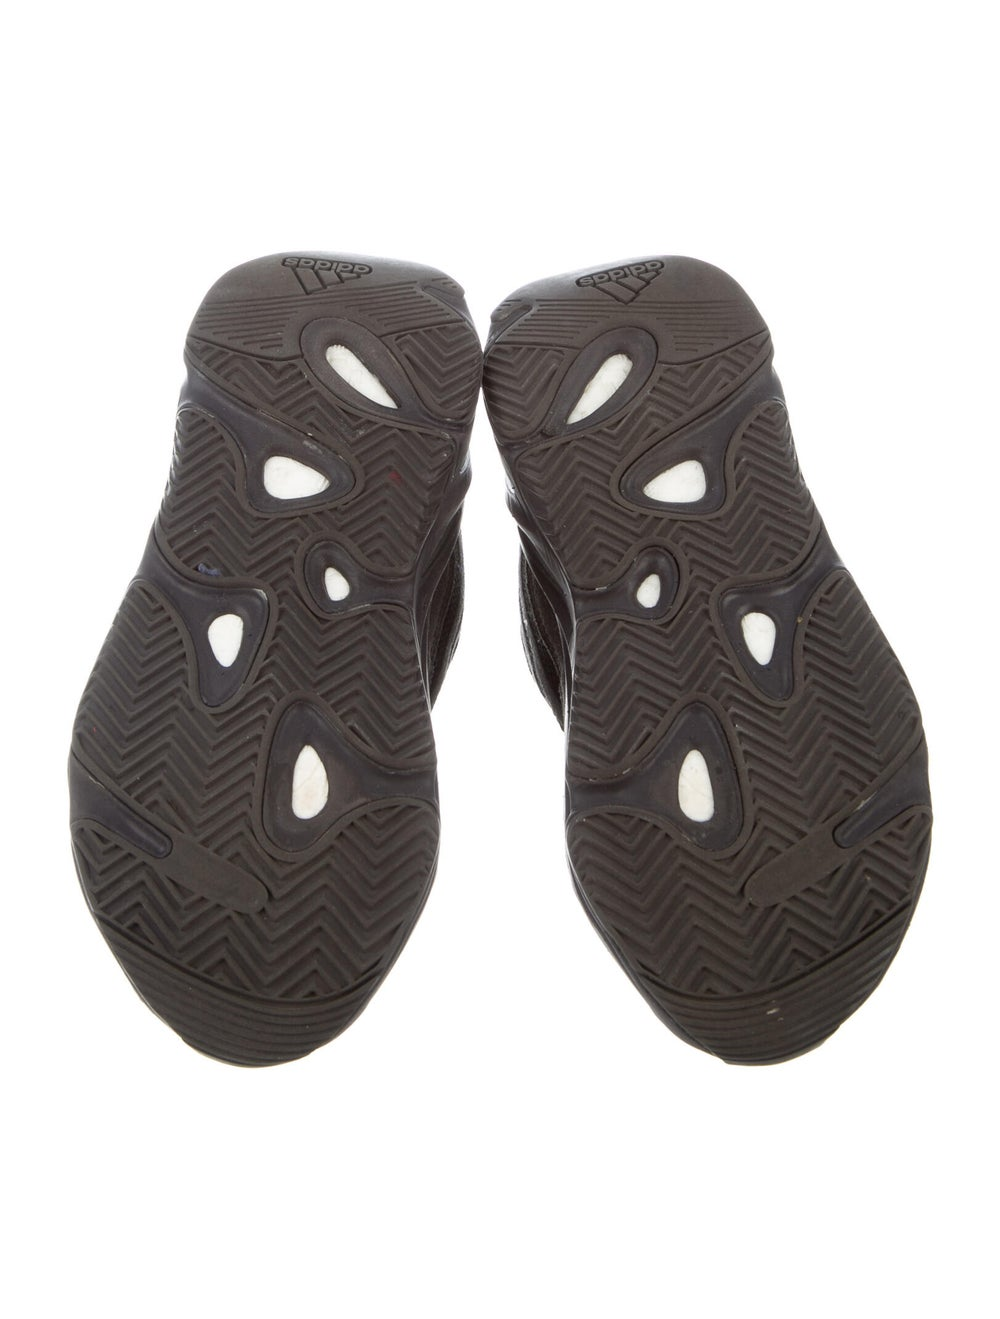 Yeezy x adidas 2019 Boost 700 V2 Vanta Sneakers S… - image 5